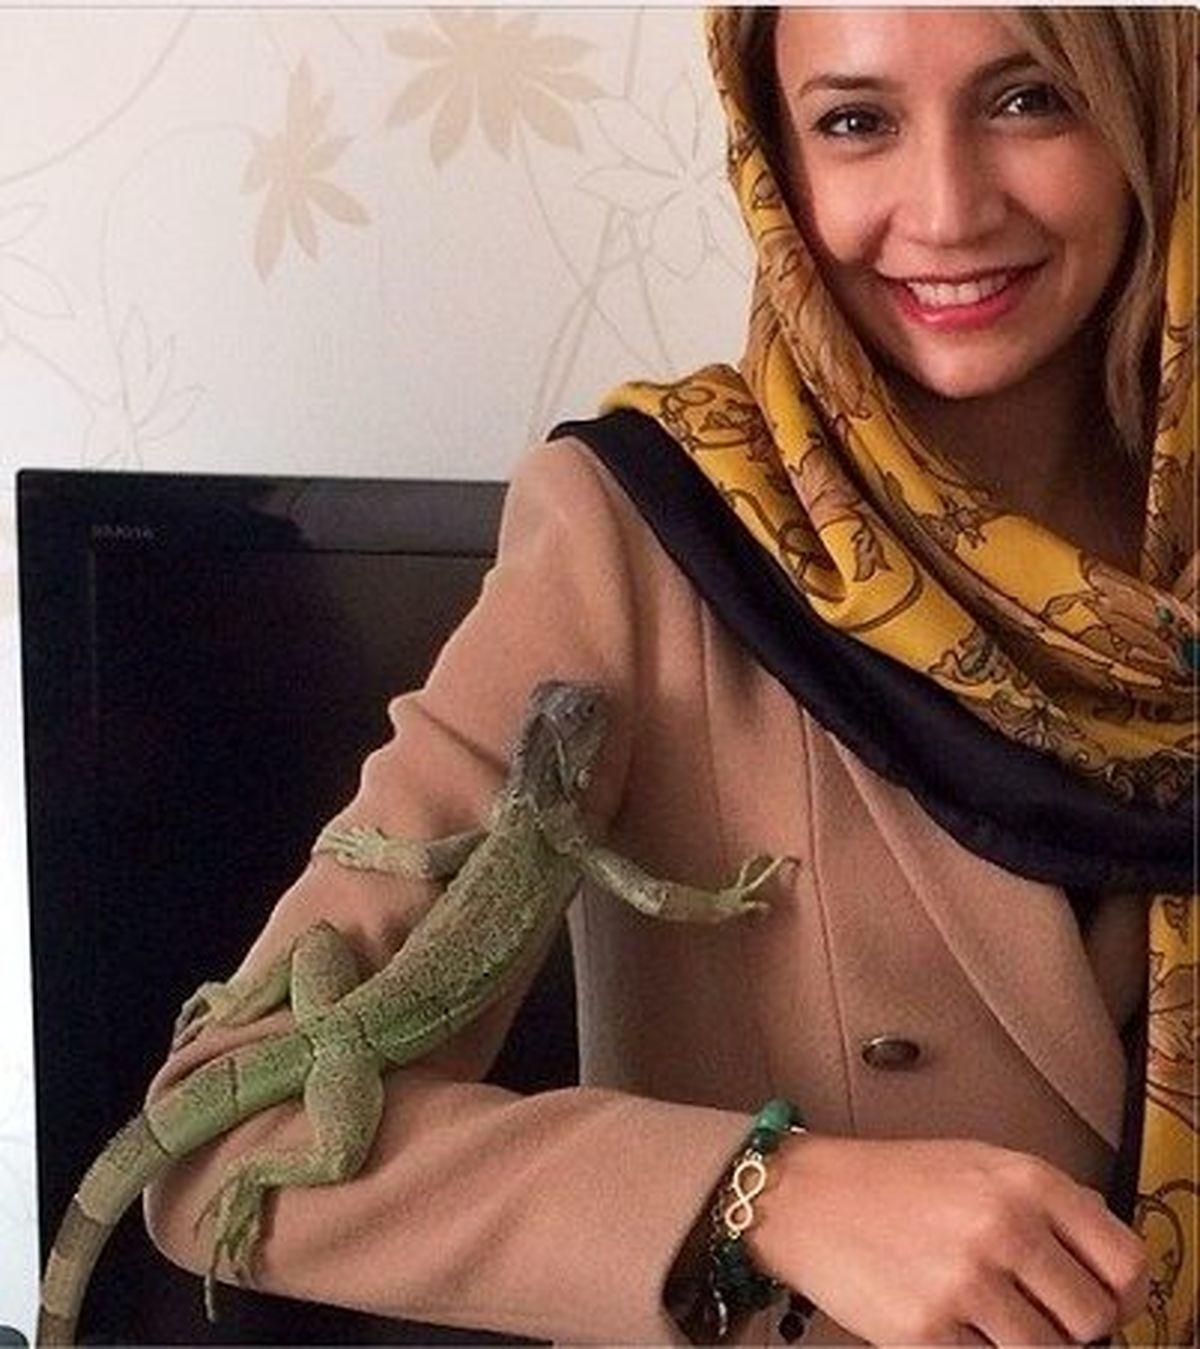 حیوان خانگی عجیب و ترسناک شبنم قلی خانی+عکس